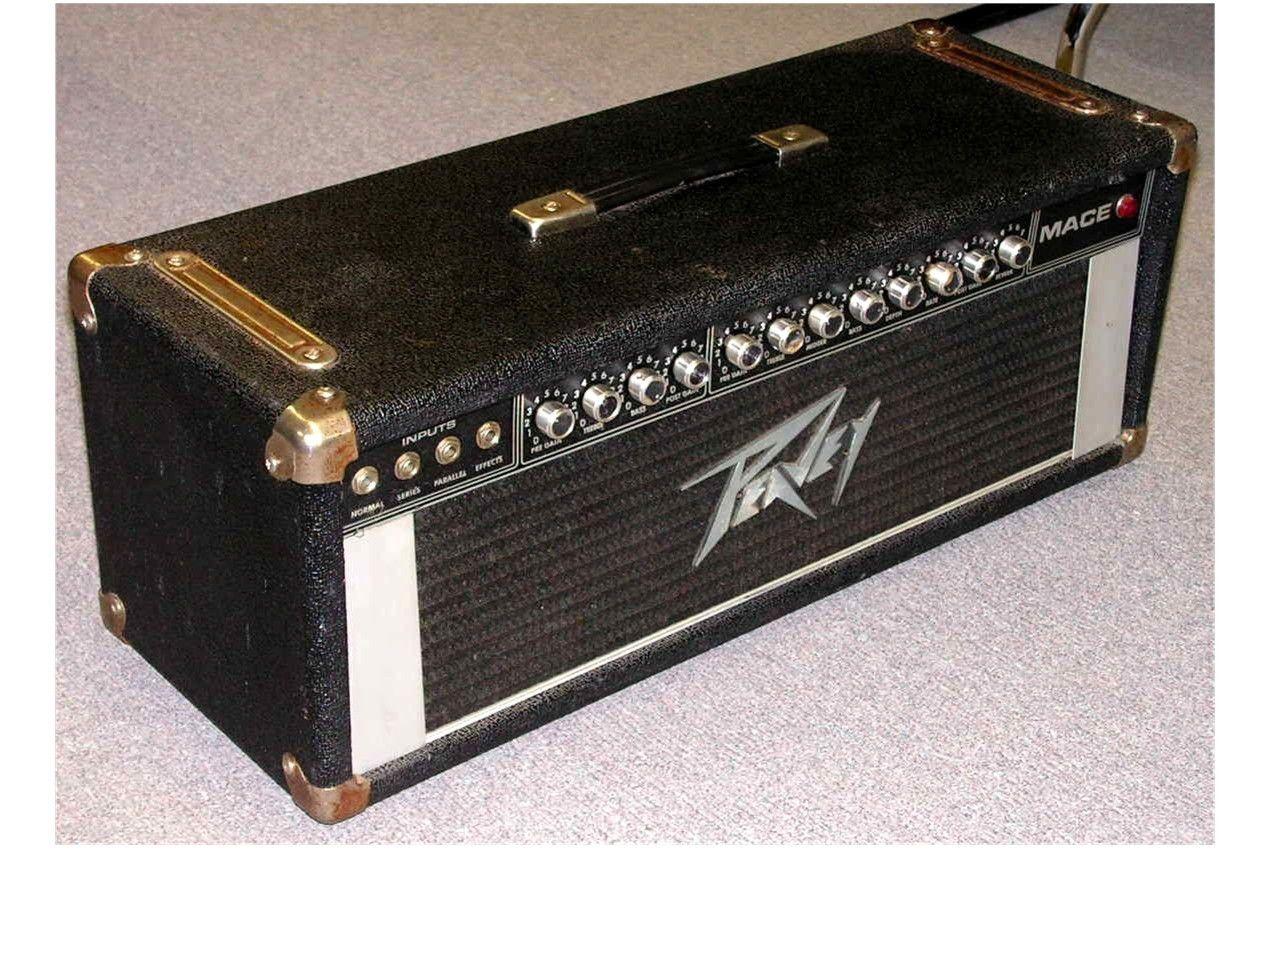 Two vintage technics amps measured